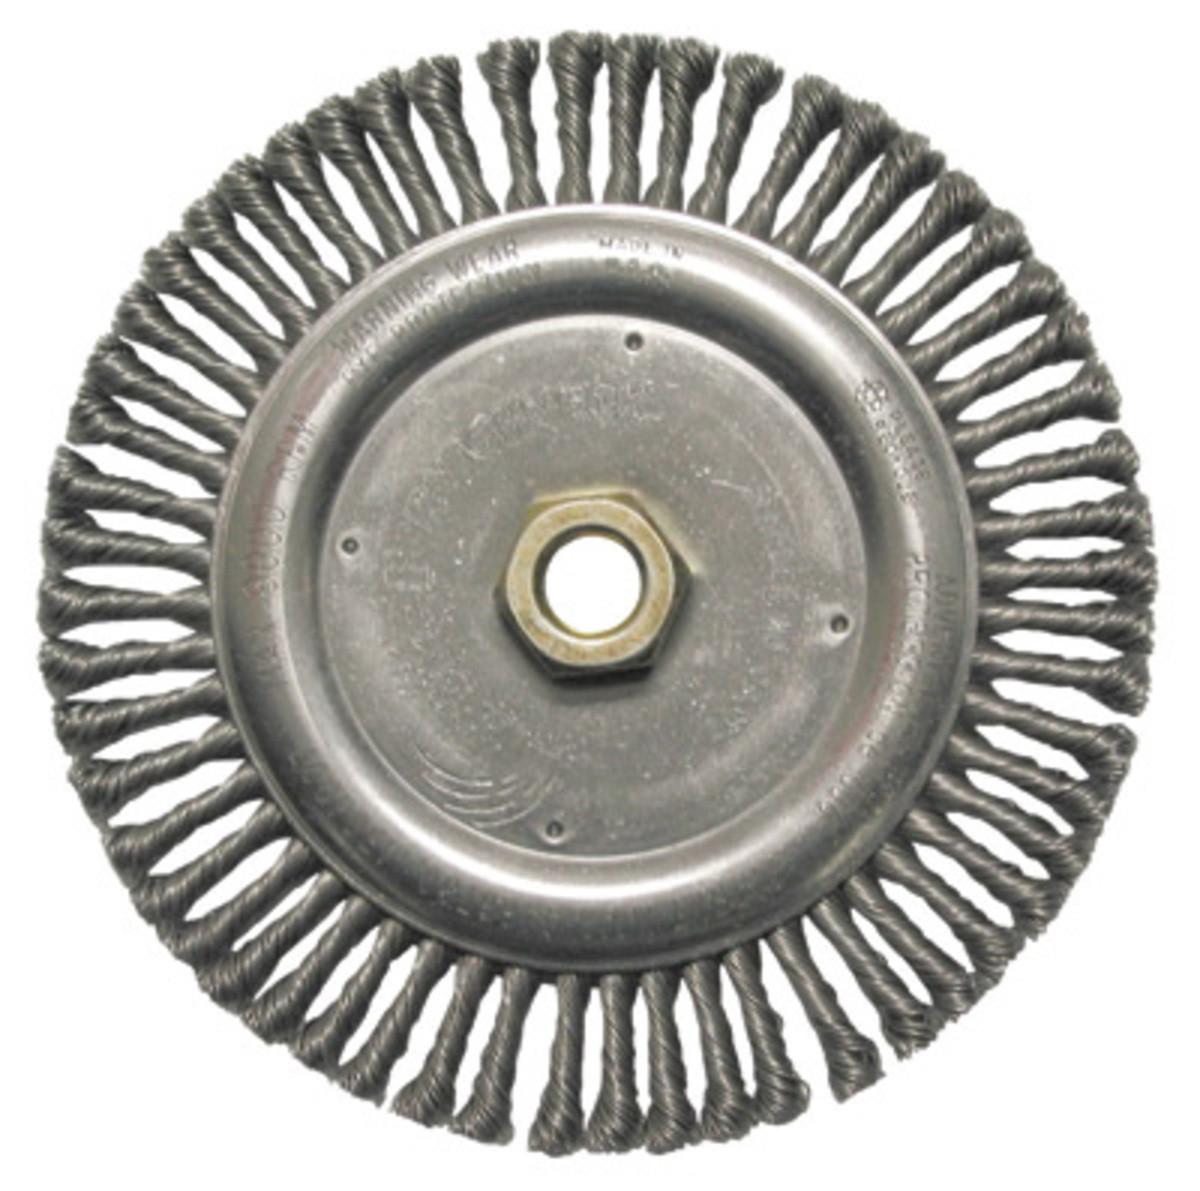 Щётка дисковая D 178 x 6 x 22,2 mm. Weiler Жгутовая стальная проволока 0,5mm